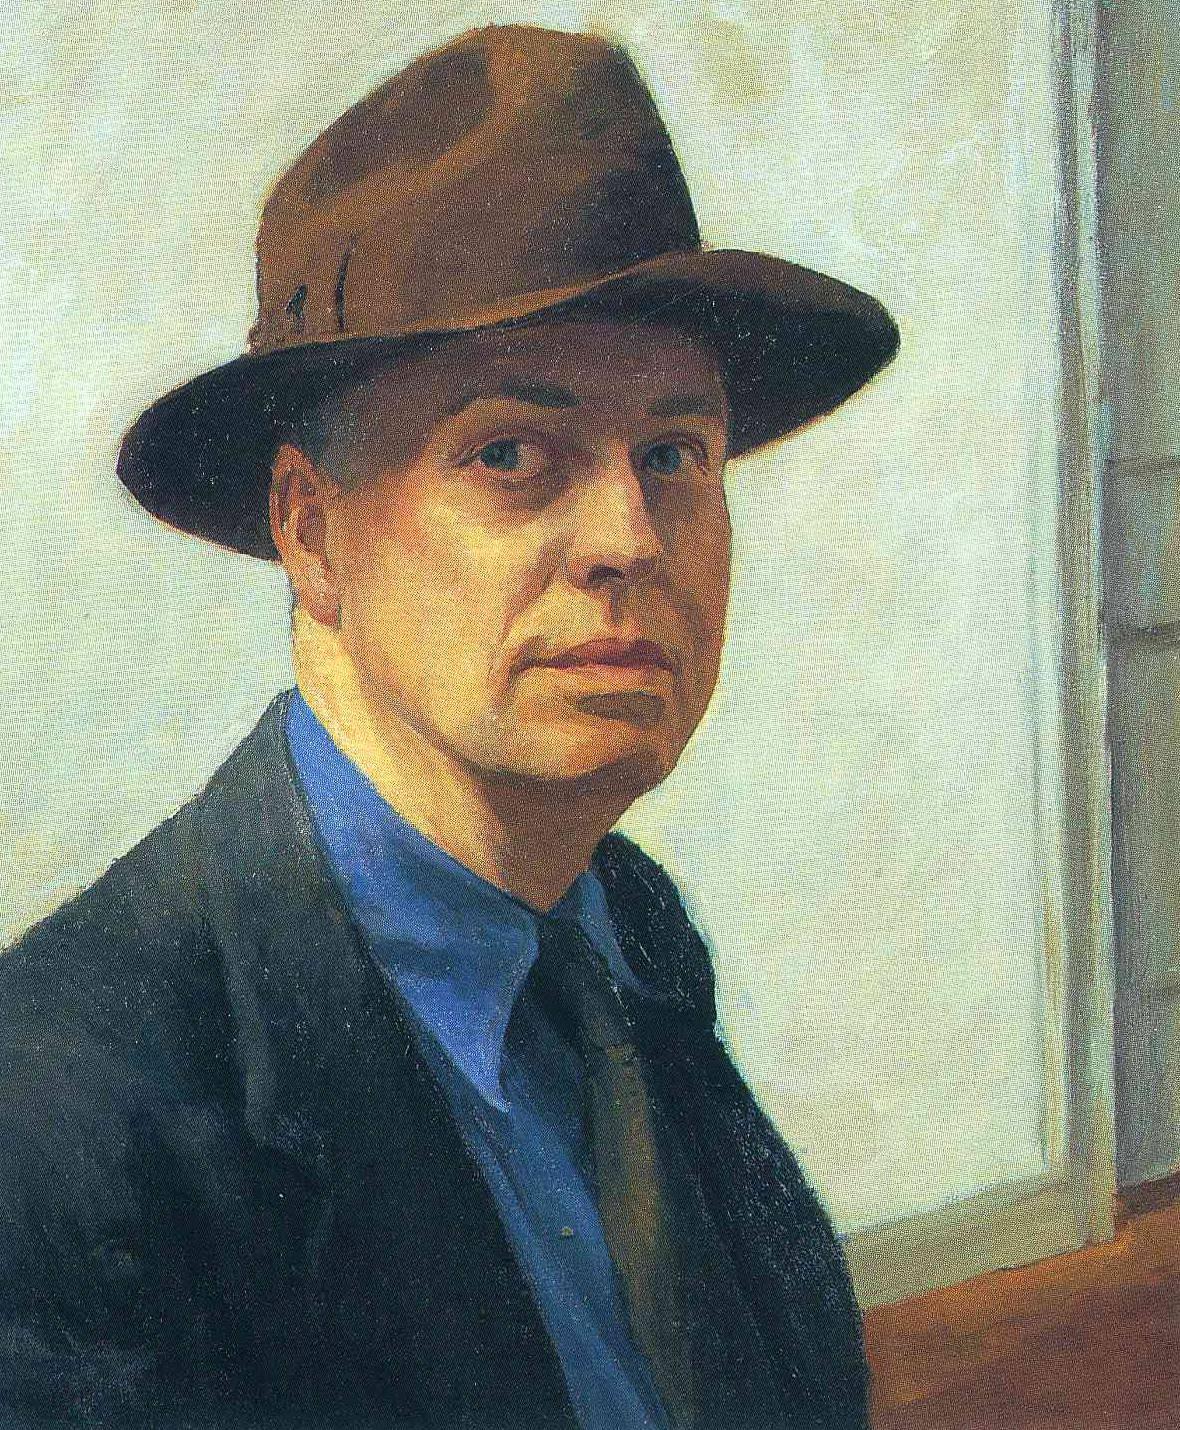 Edward Hopper, Self Portrait, 1925-1930